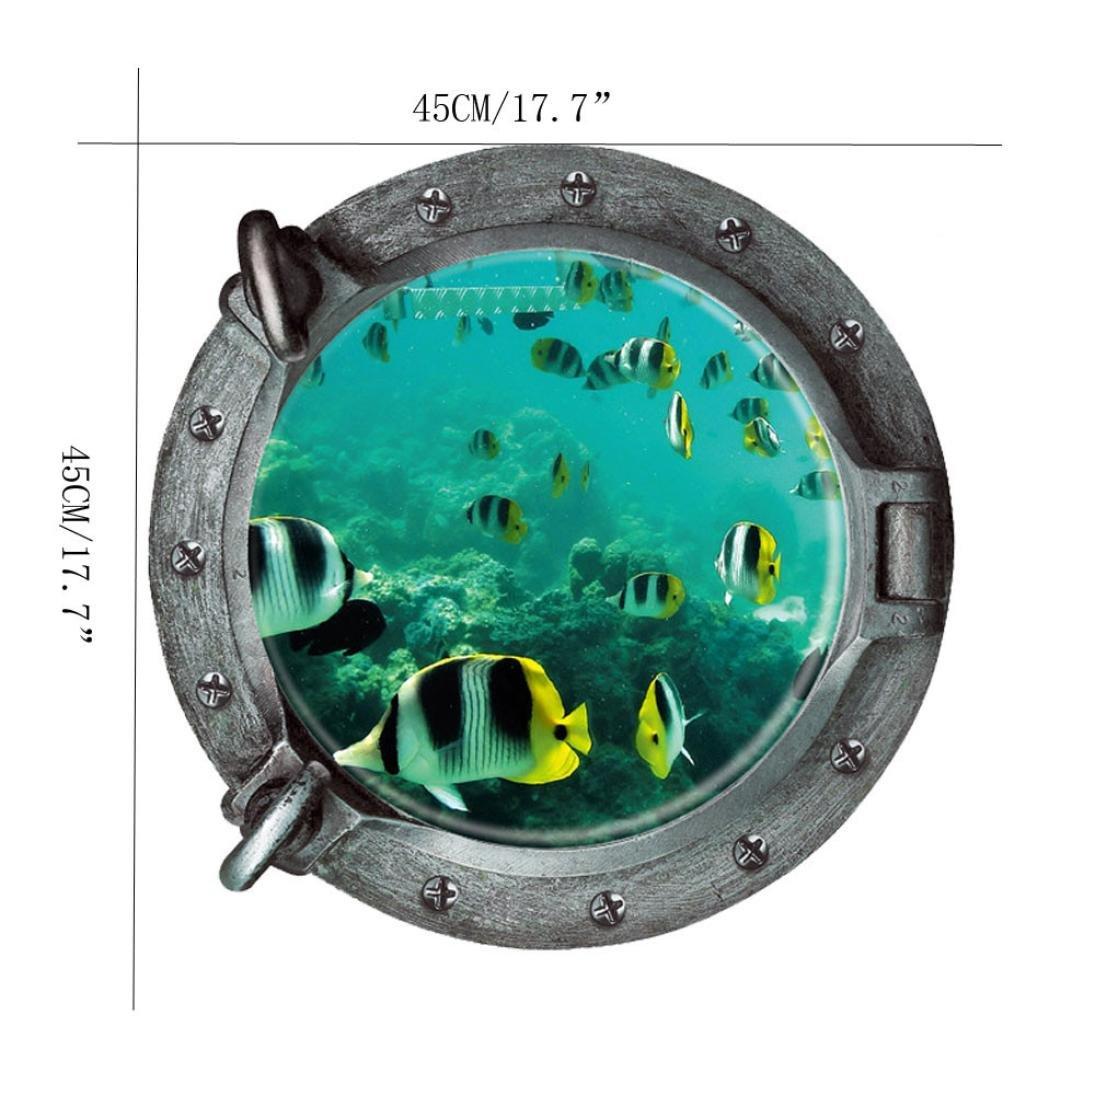 Jamicy/® Fantastischen u-Boot-Bullaugen Fisch Unterwasser Welt Wand Aufkleber Home Decor A Wandtattoo Wandsticker